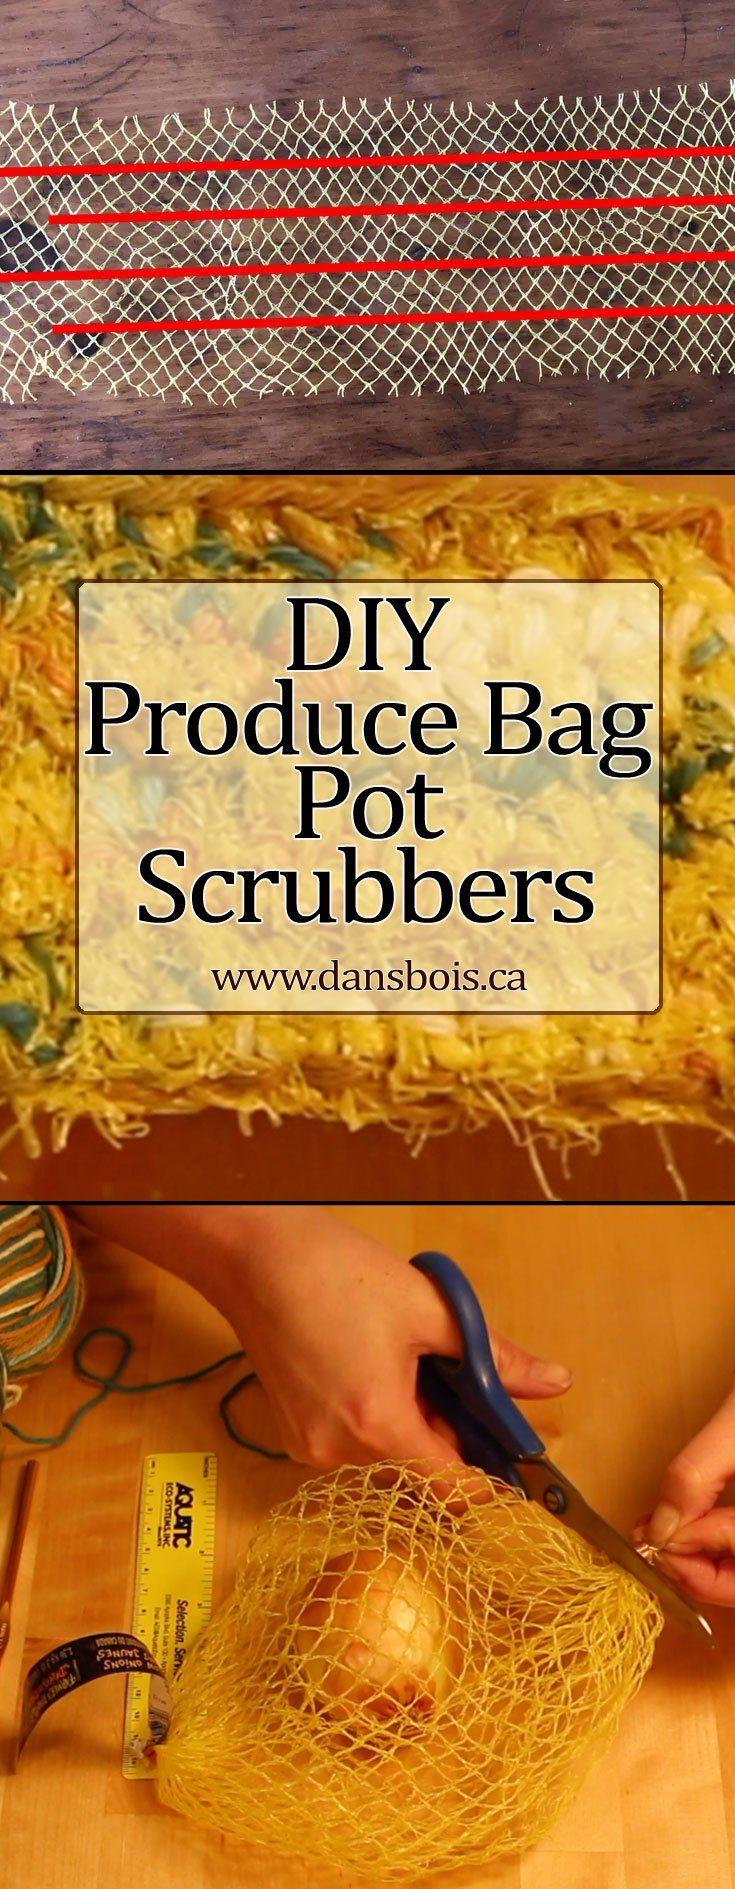 Reusing Onion Bags To Crochet Pot Scrubbers Step By Step #crochet #potscrubber #scrubby #reuse #repurposed